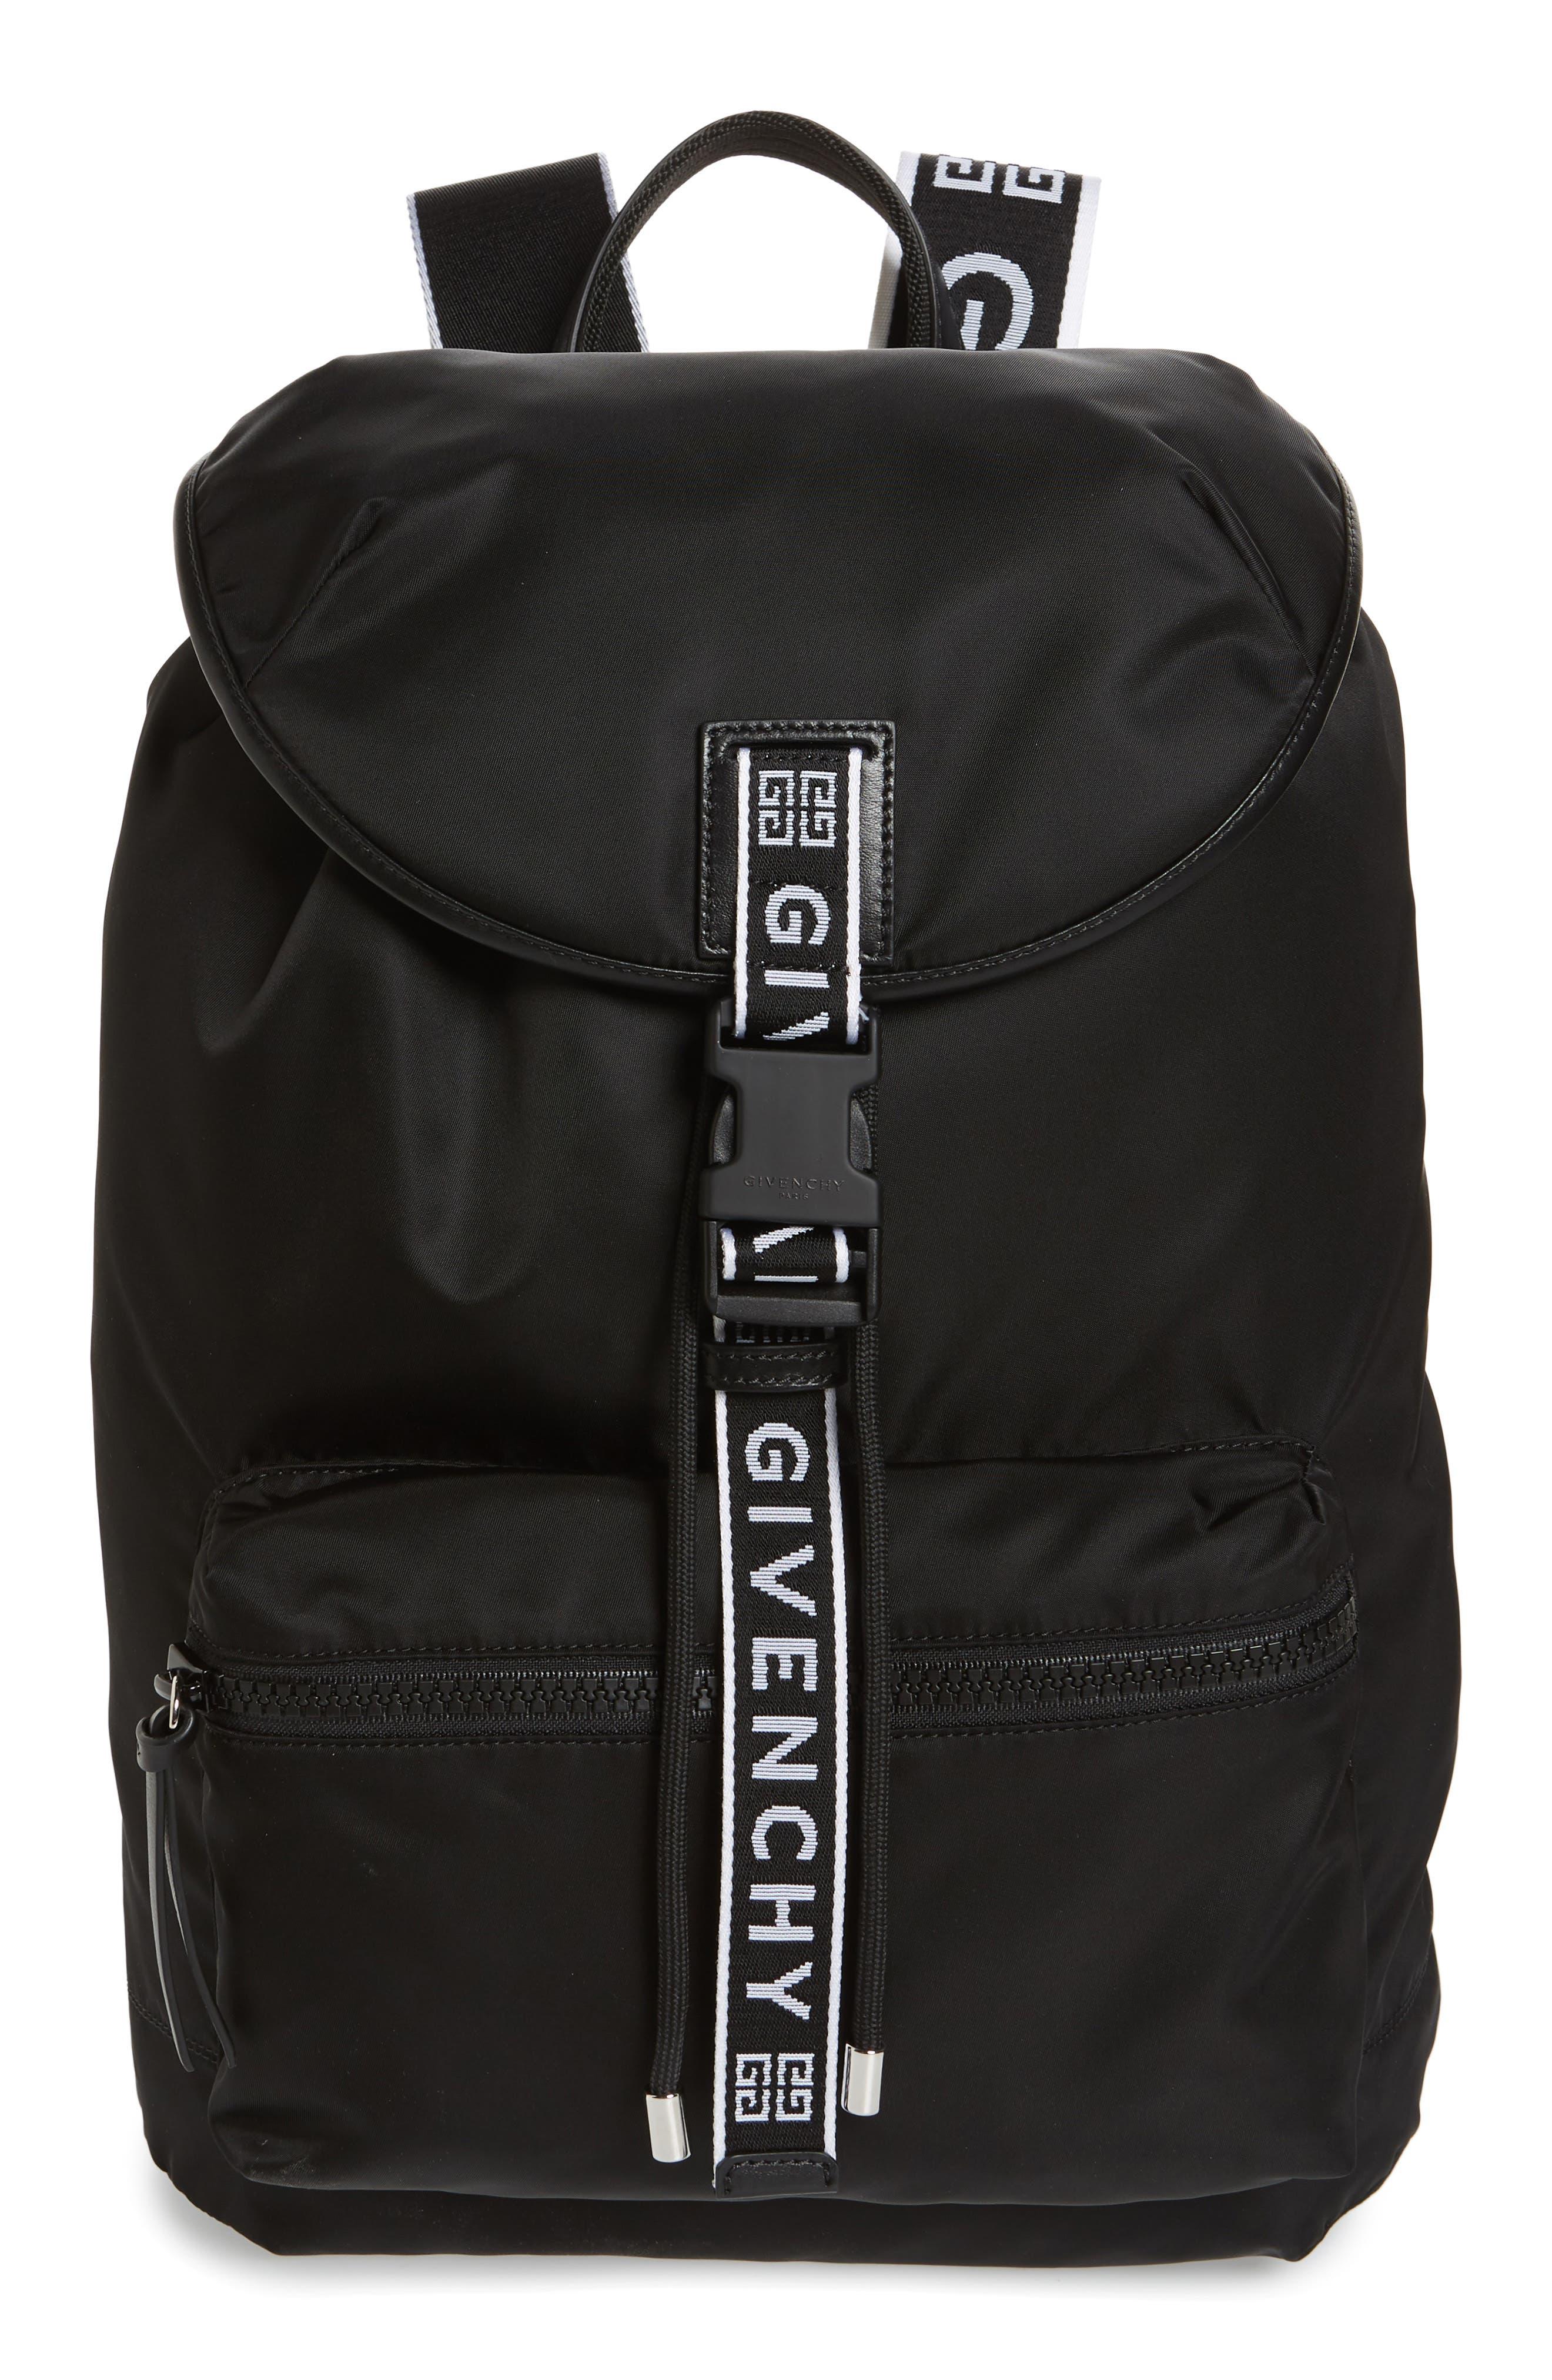 GIVENCHY, Light 3 Backpack, Main thumbnail 1, color, BLACK/ WHITE